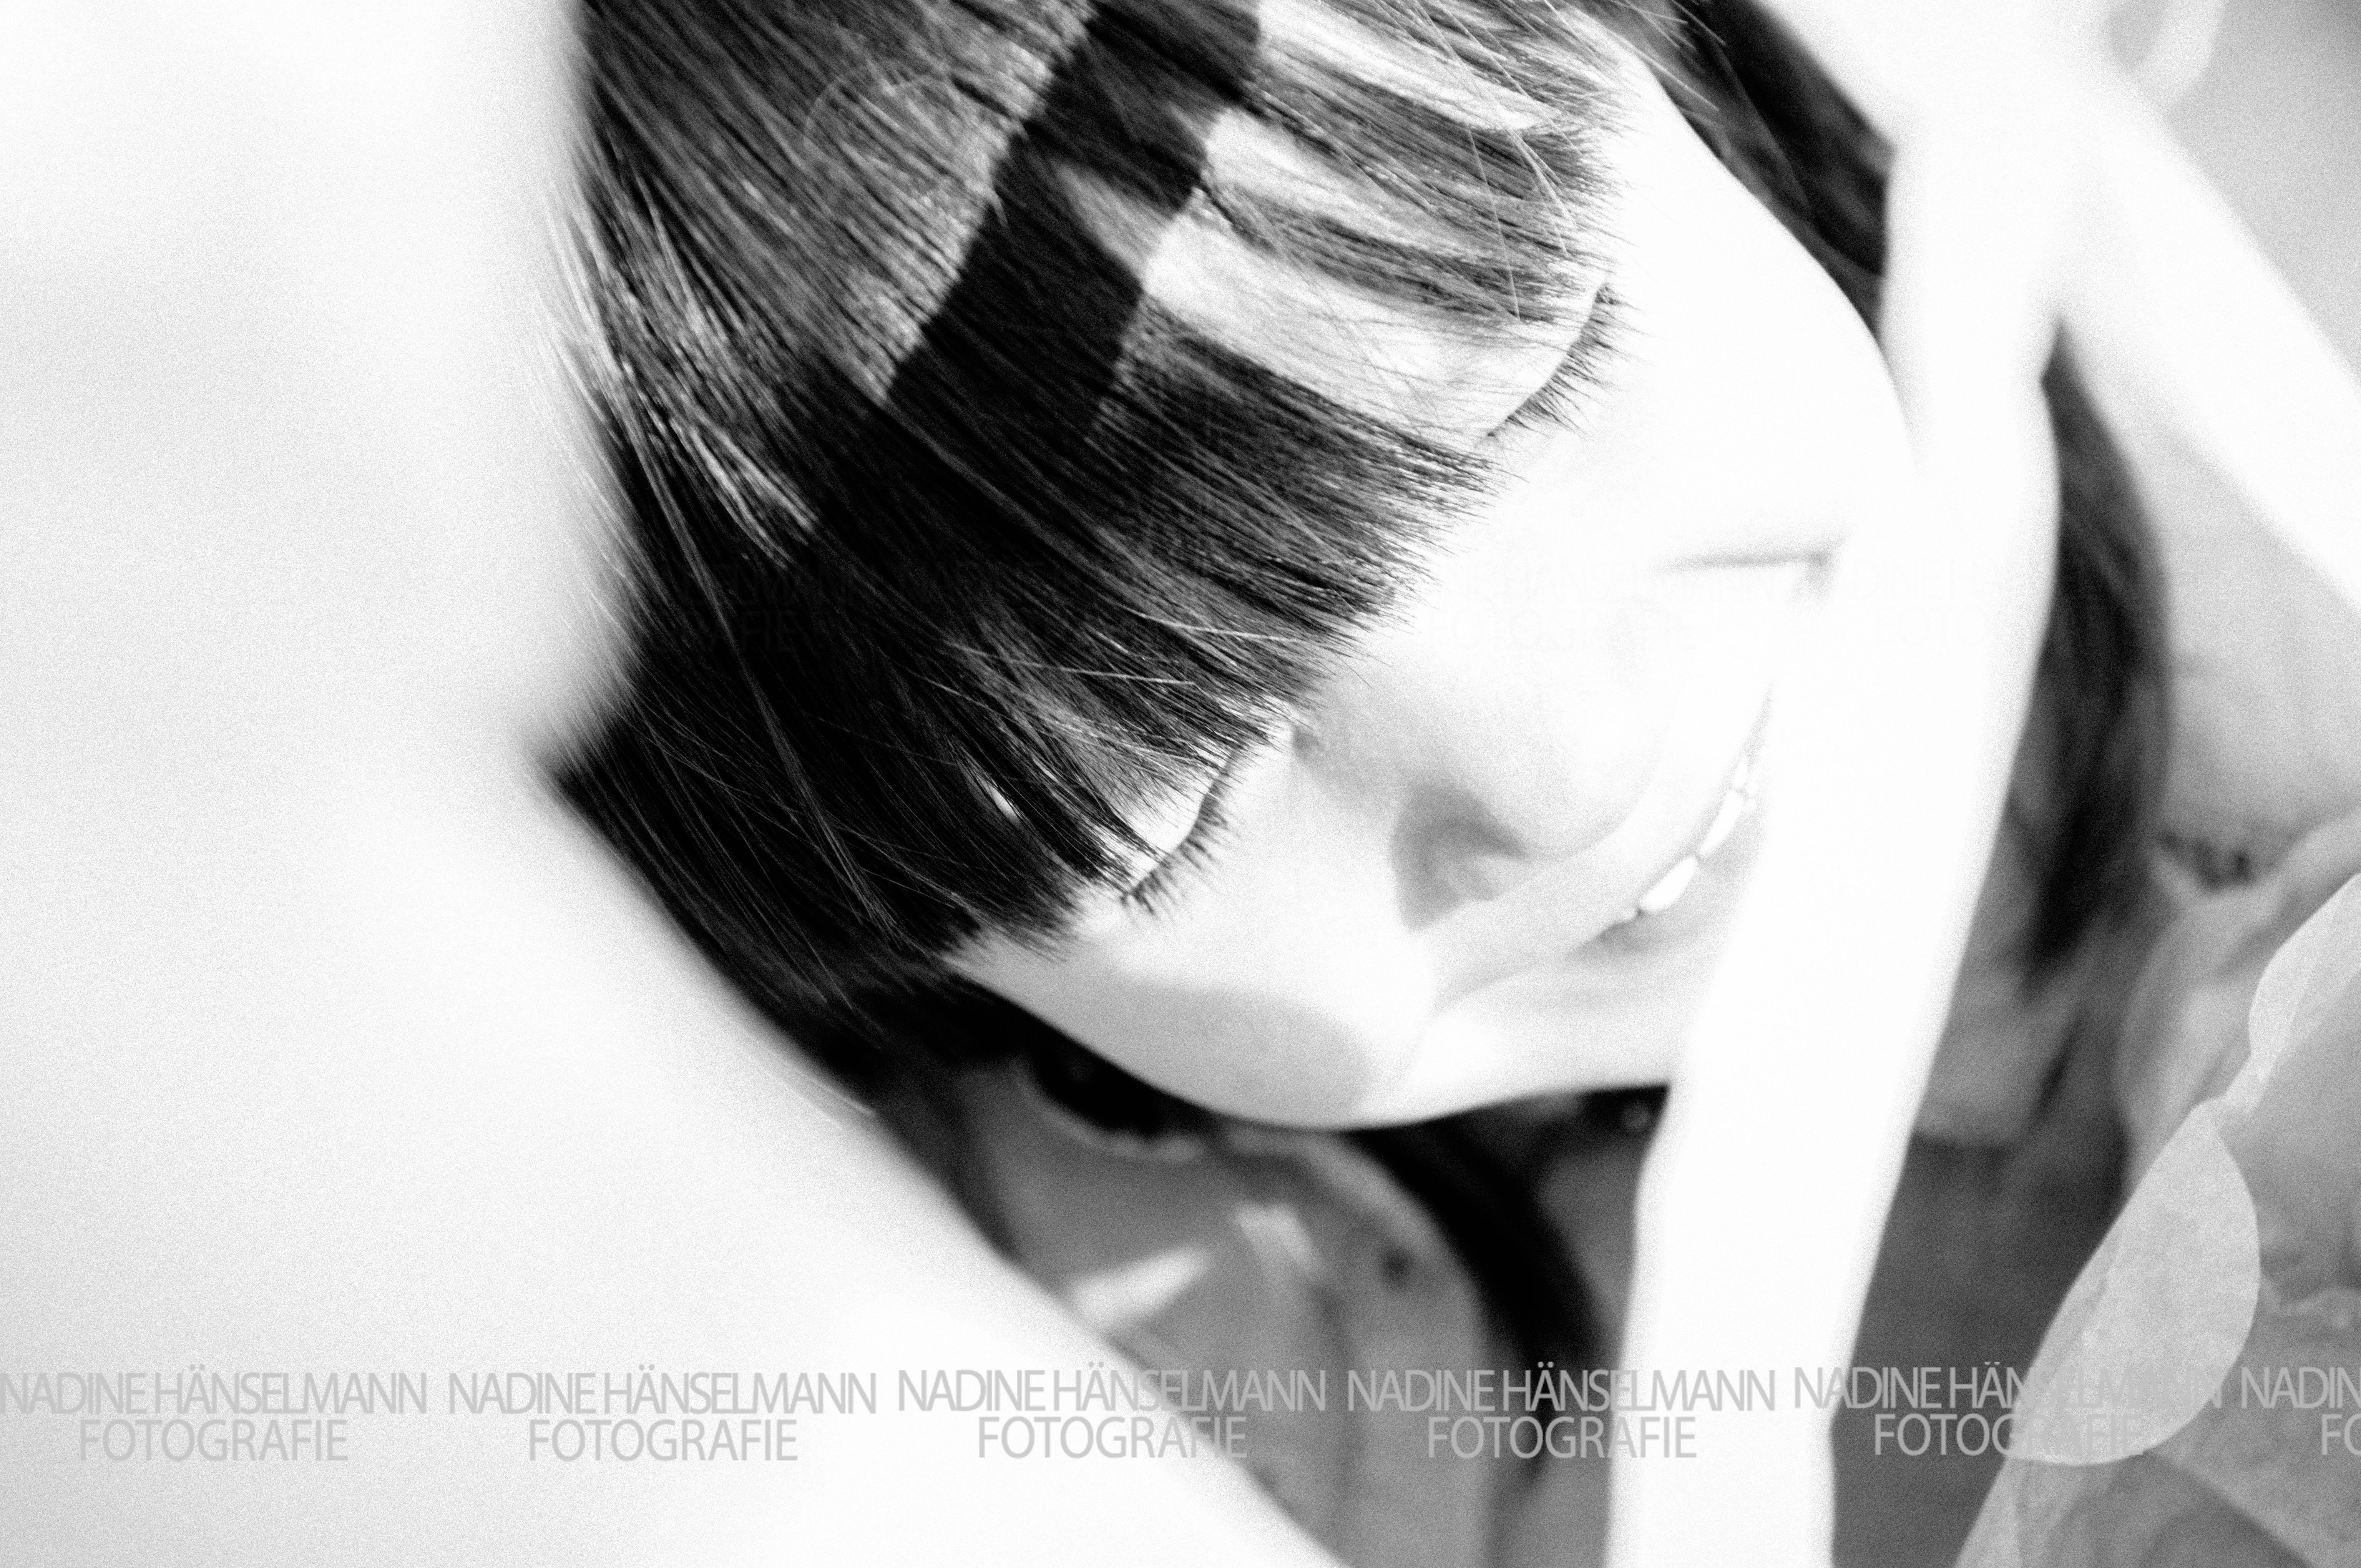 HaenselmannFotografie-3804